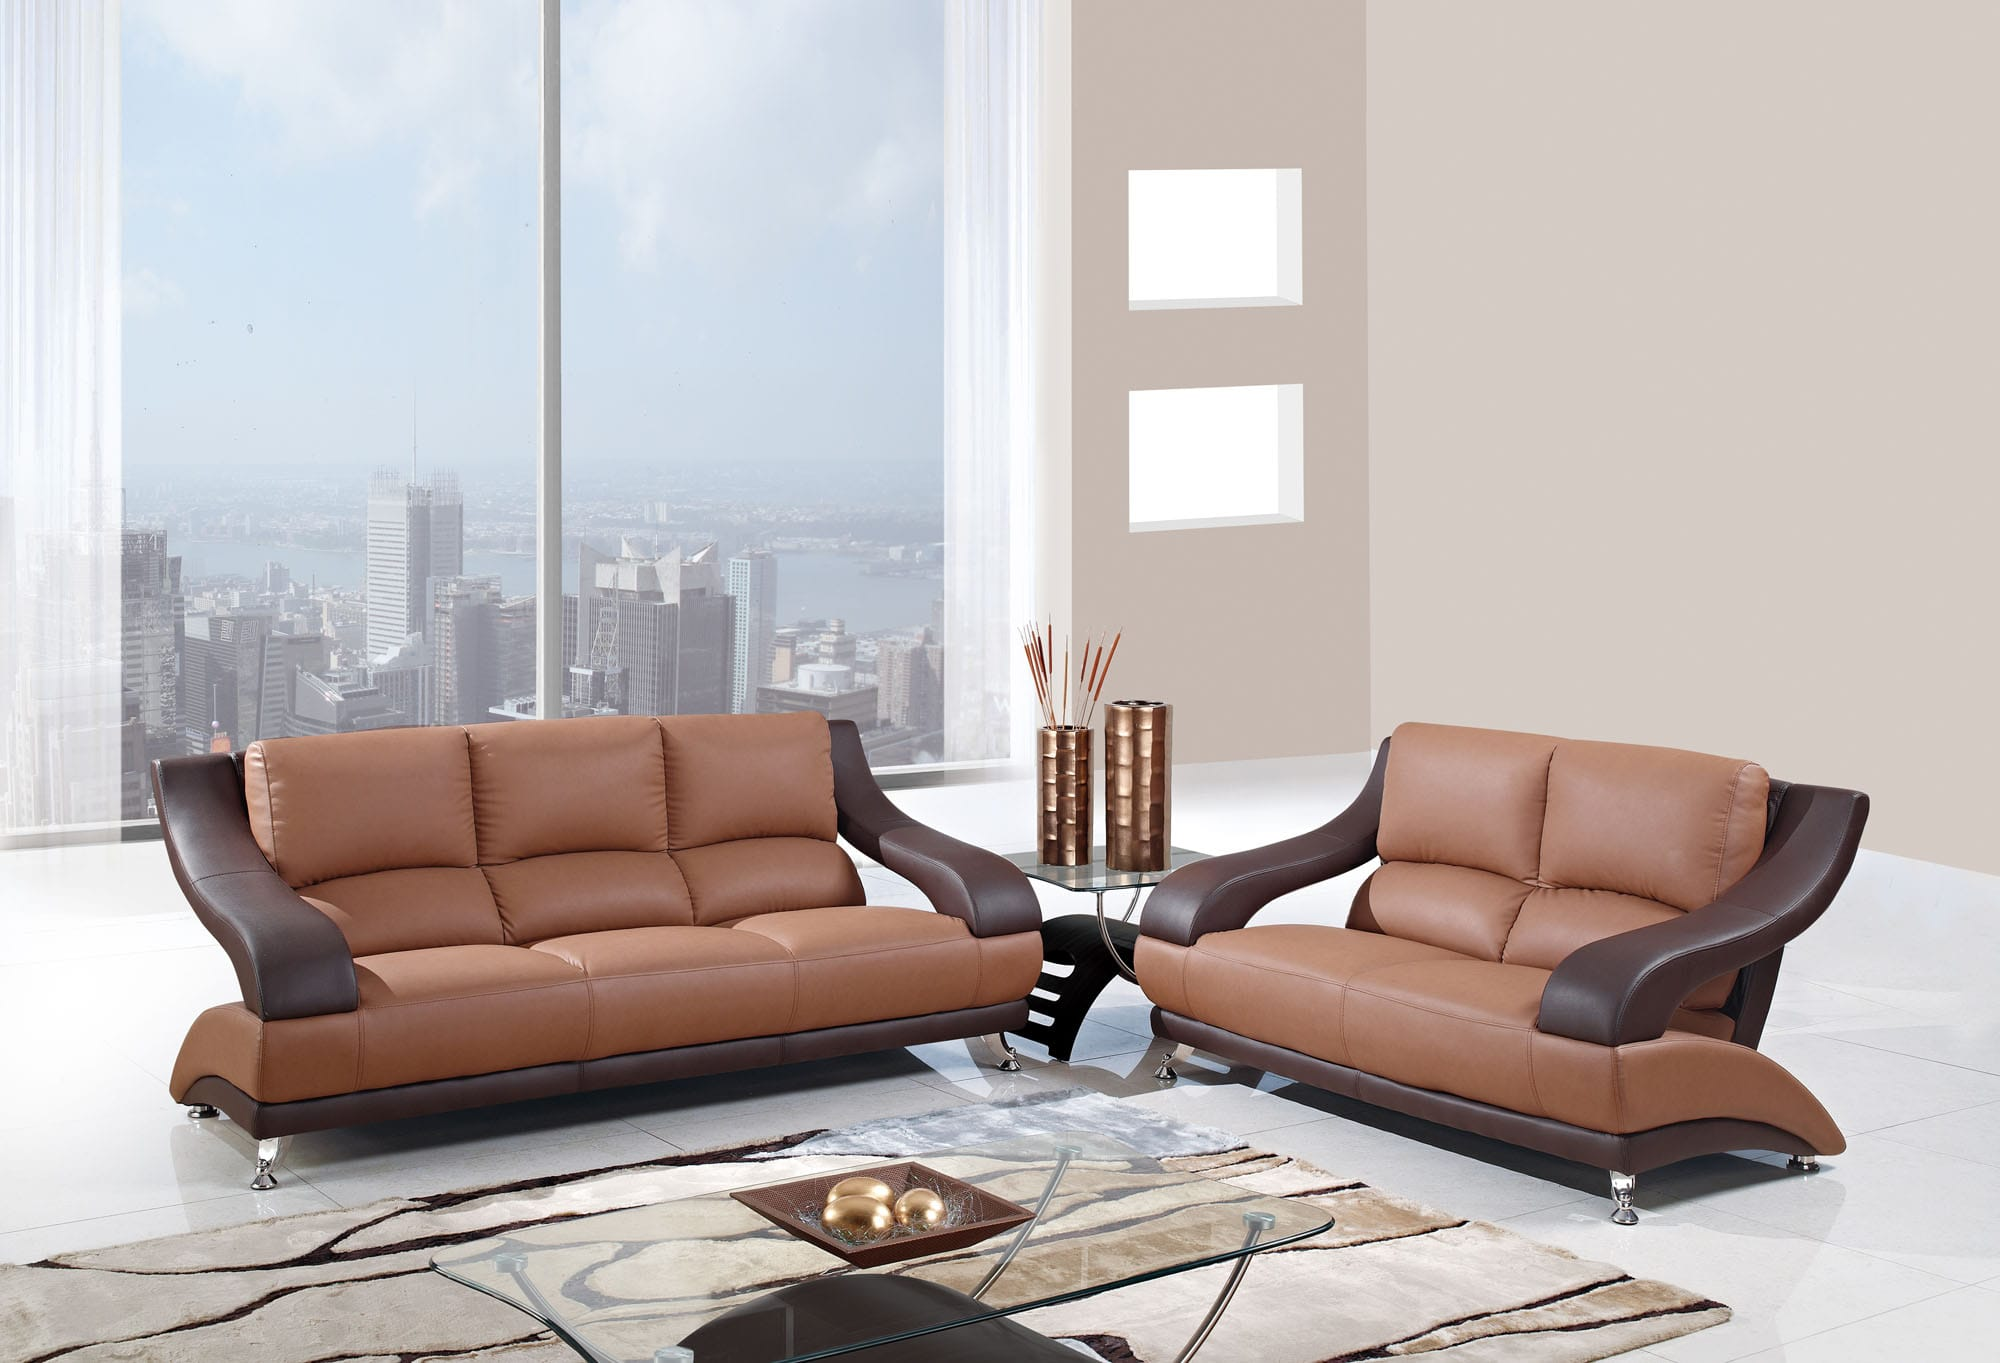 U982 Tan Brown Bonded Sofa by Global Furniture